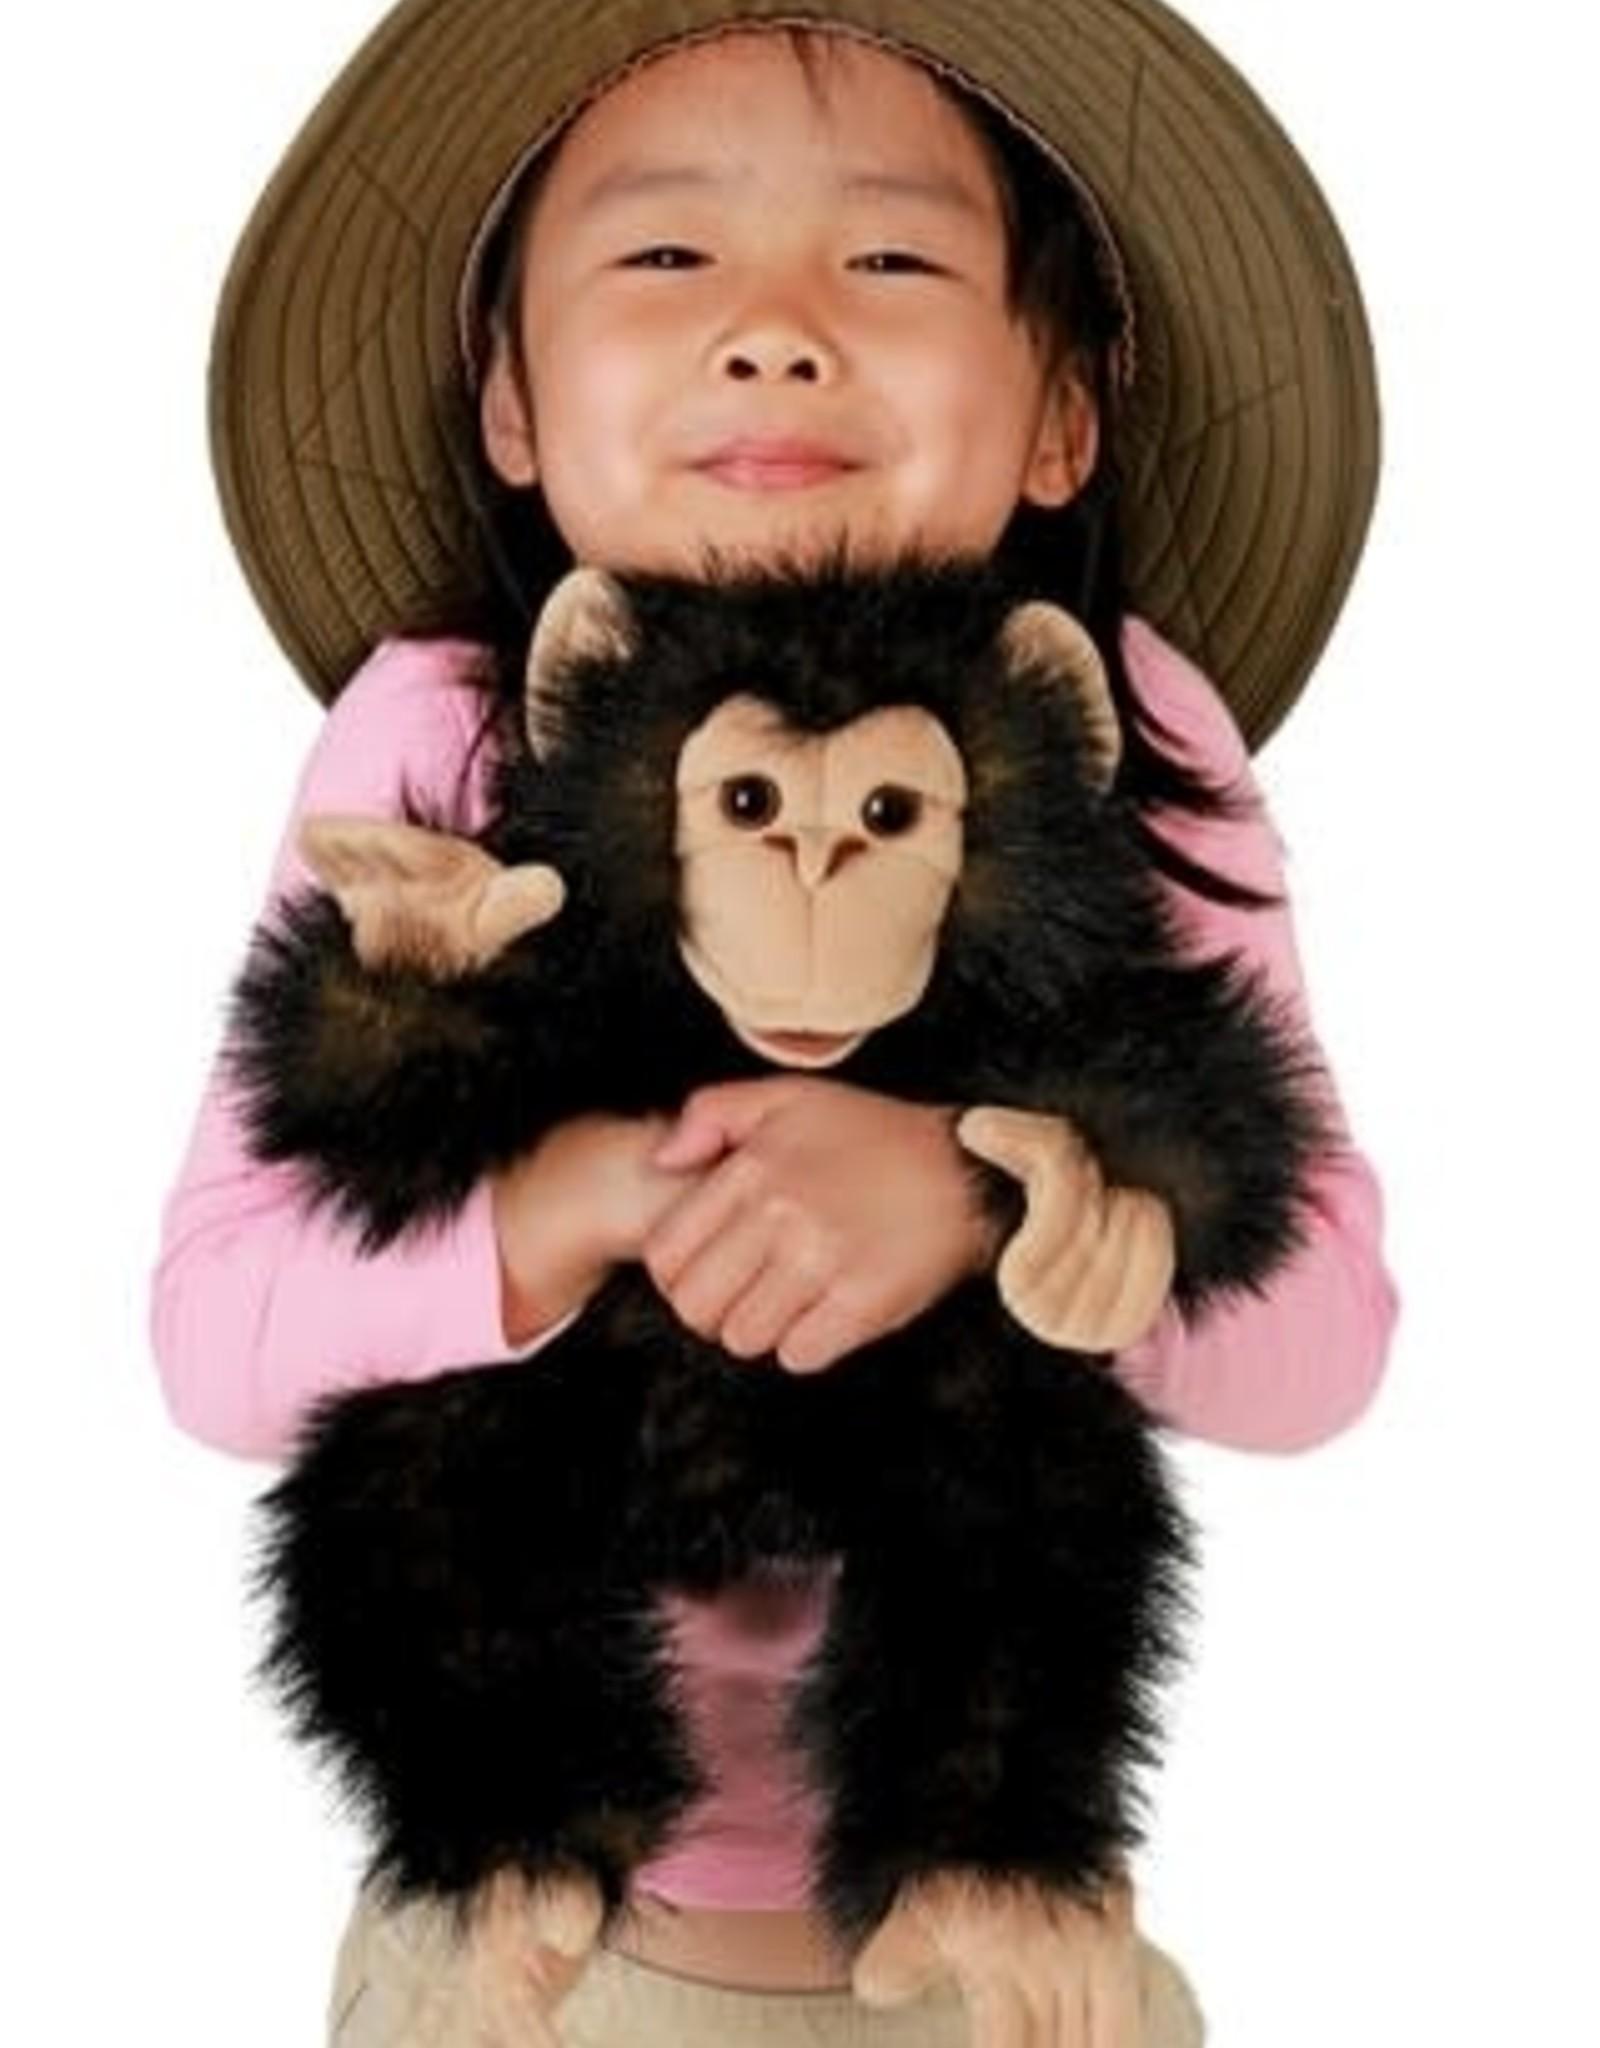 Folkmanis Folkmanis Baby Chimpanzee Puppet